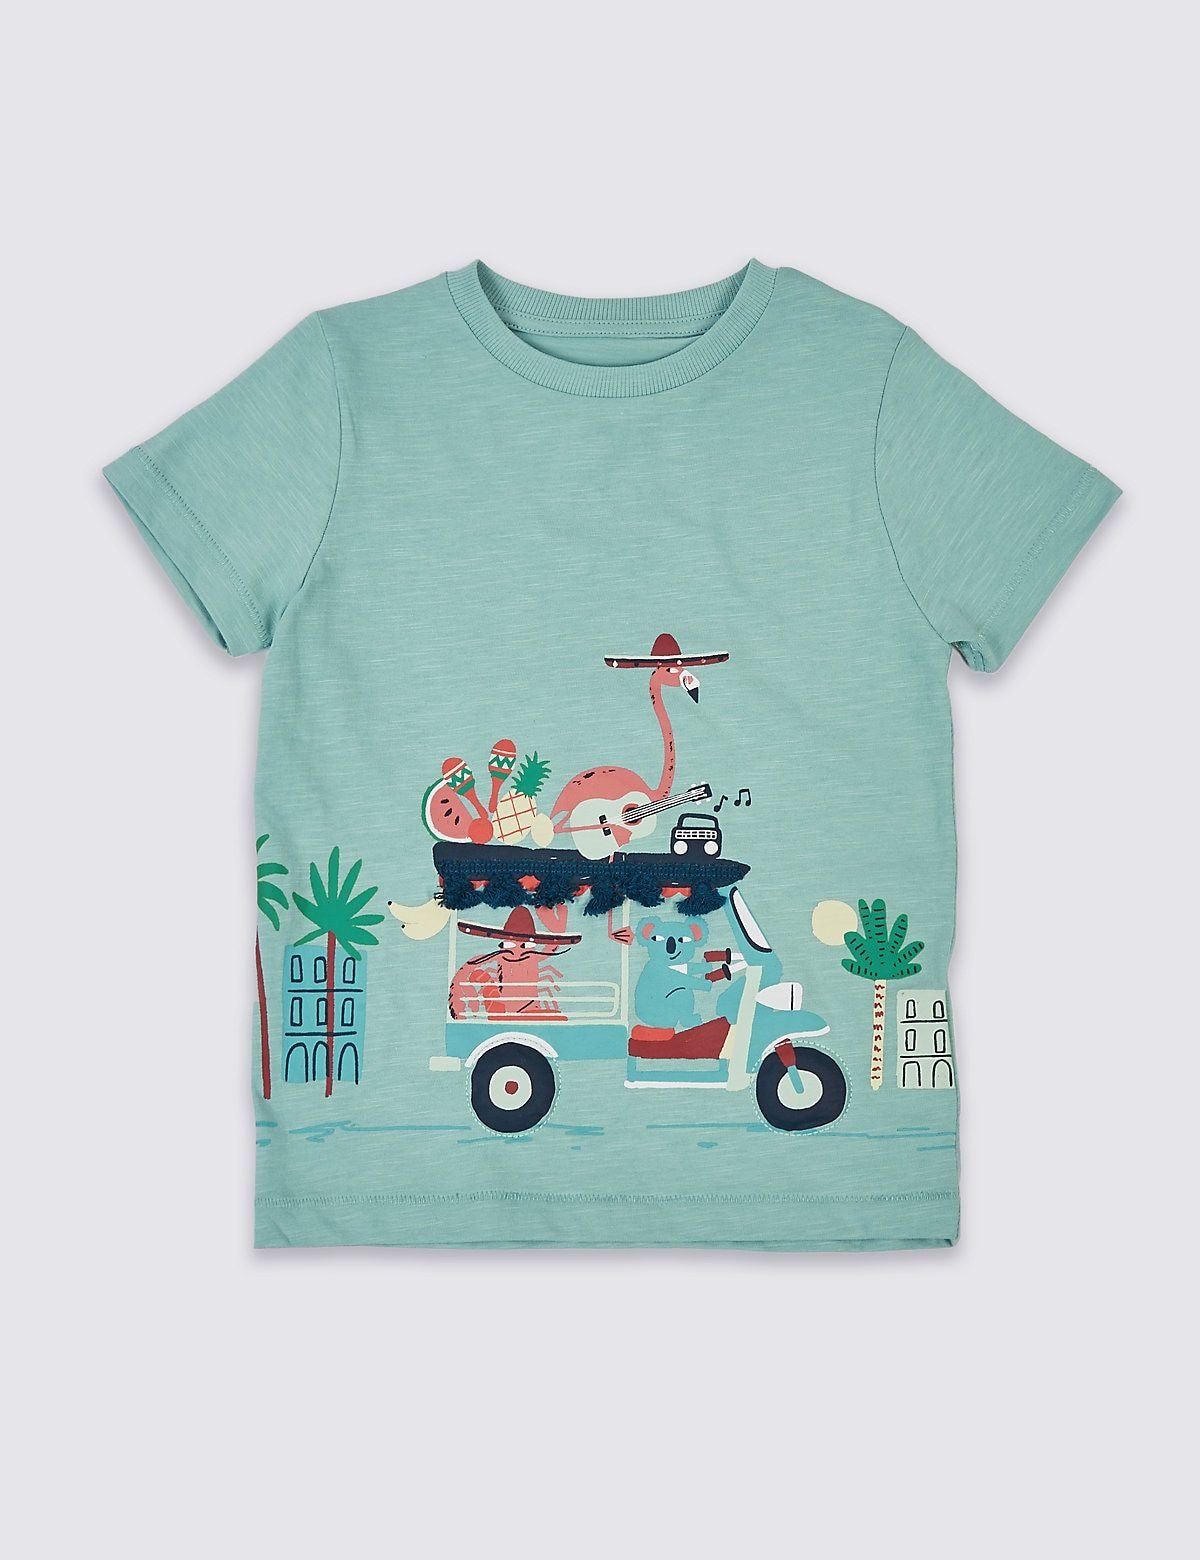 Baby Fun Imprimé Tops Infant Kids Cute Graphic Sweat-shirt manches longues t shirts